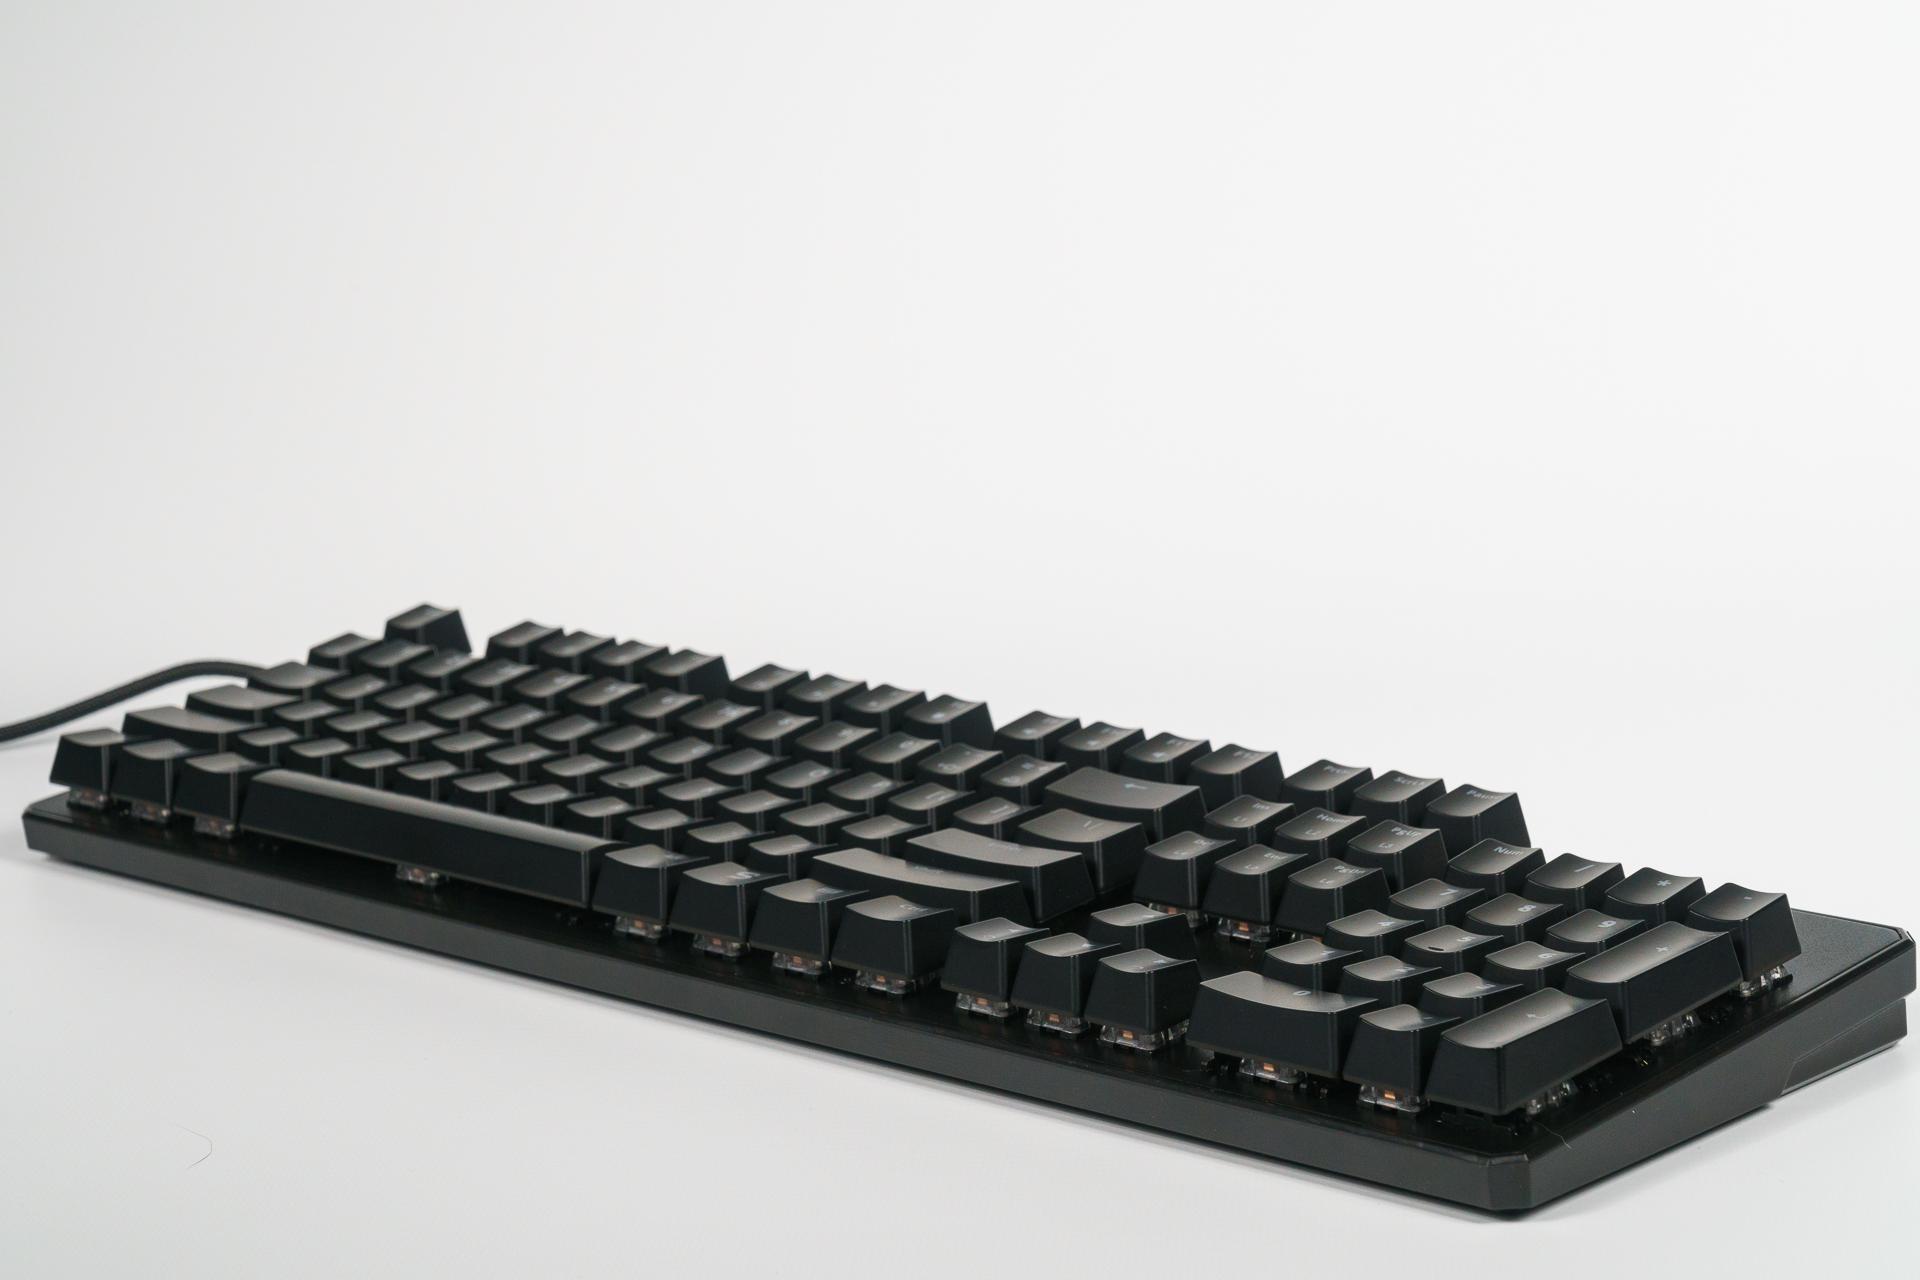 Klawiatura SPC Gear GK540 Magna - solidna jak czołg